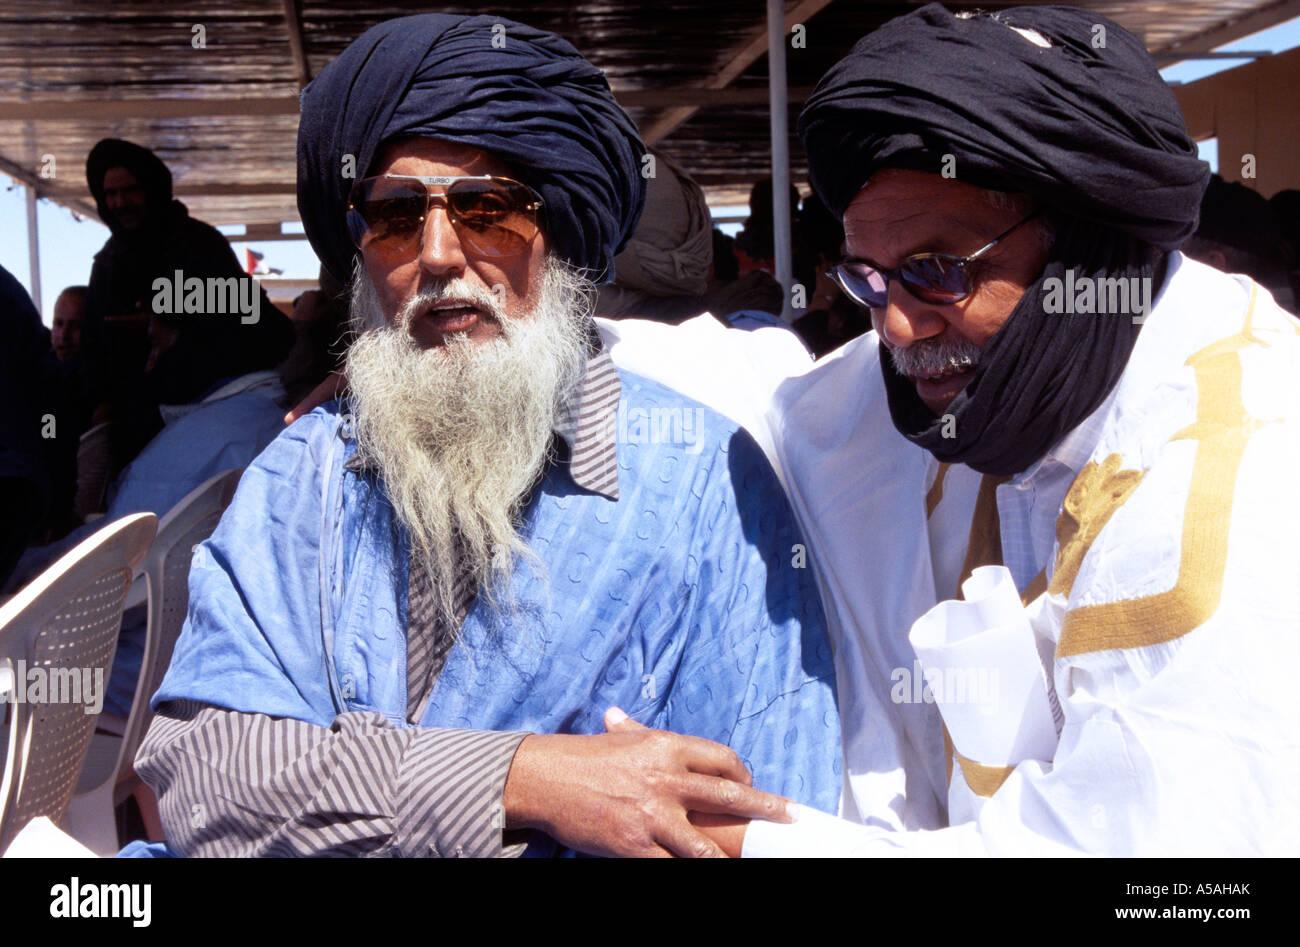 Elderly Sahrawi men in Tindouf Western Algeria - Stock Image